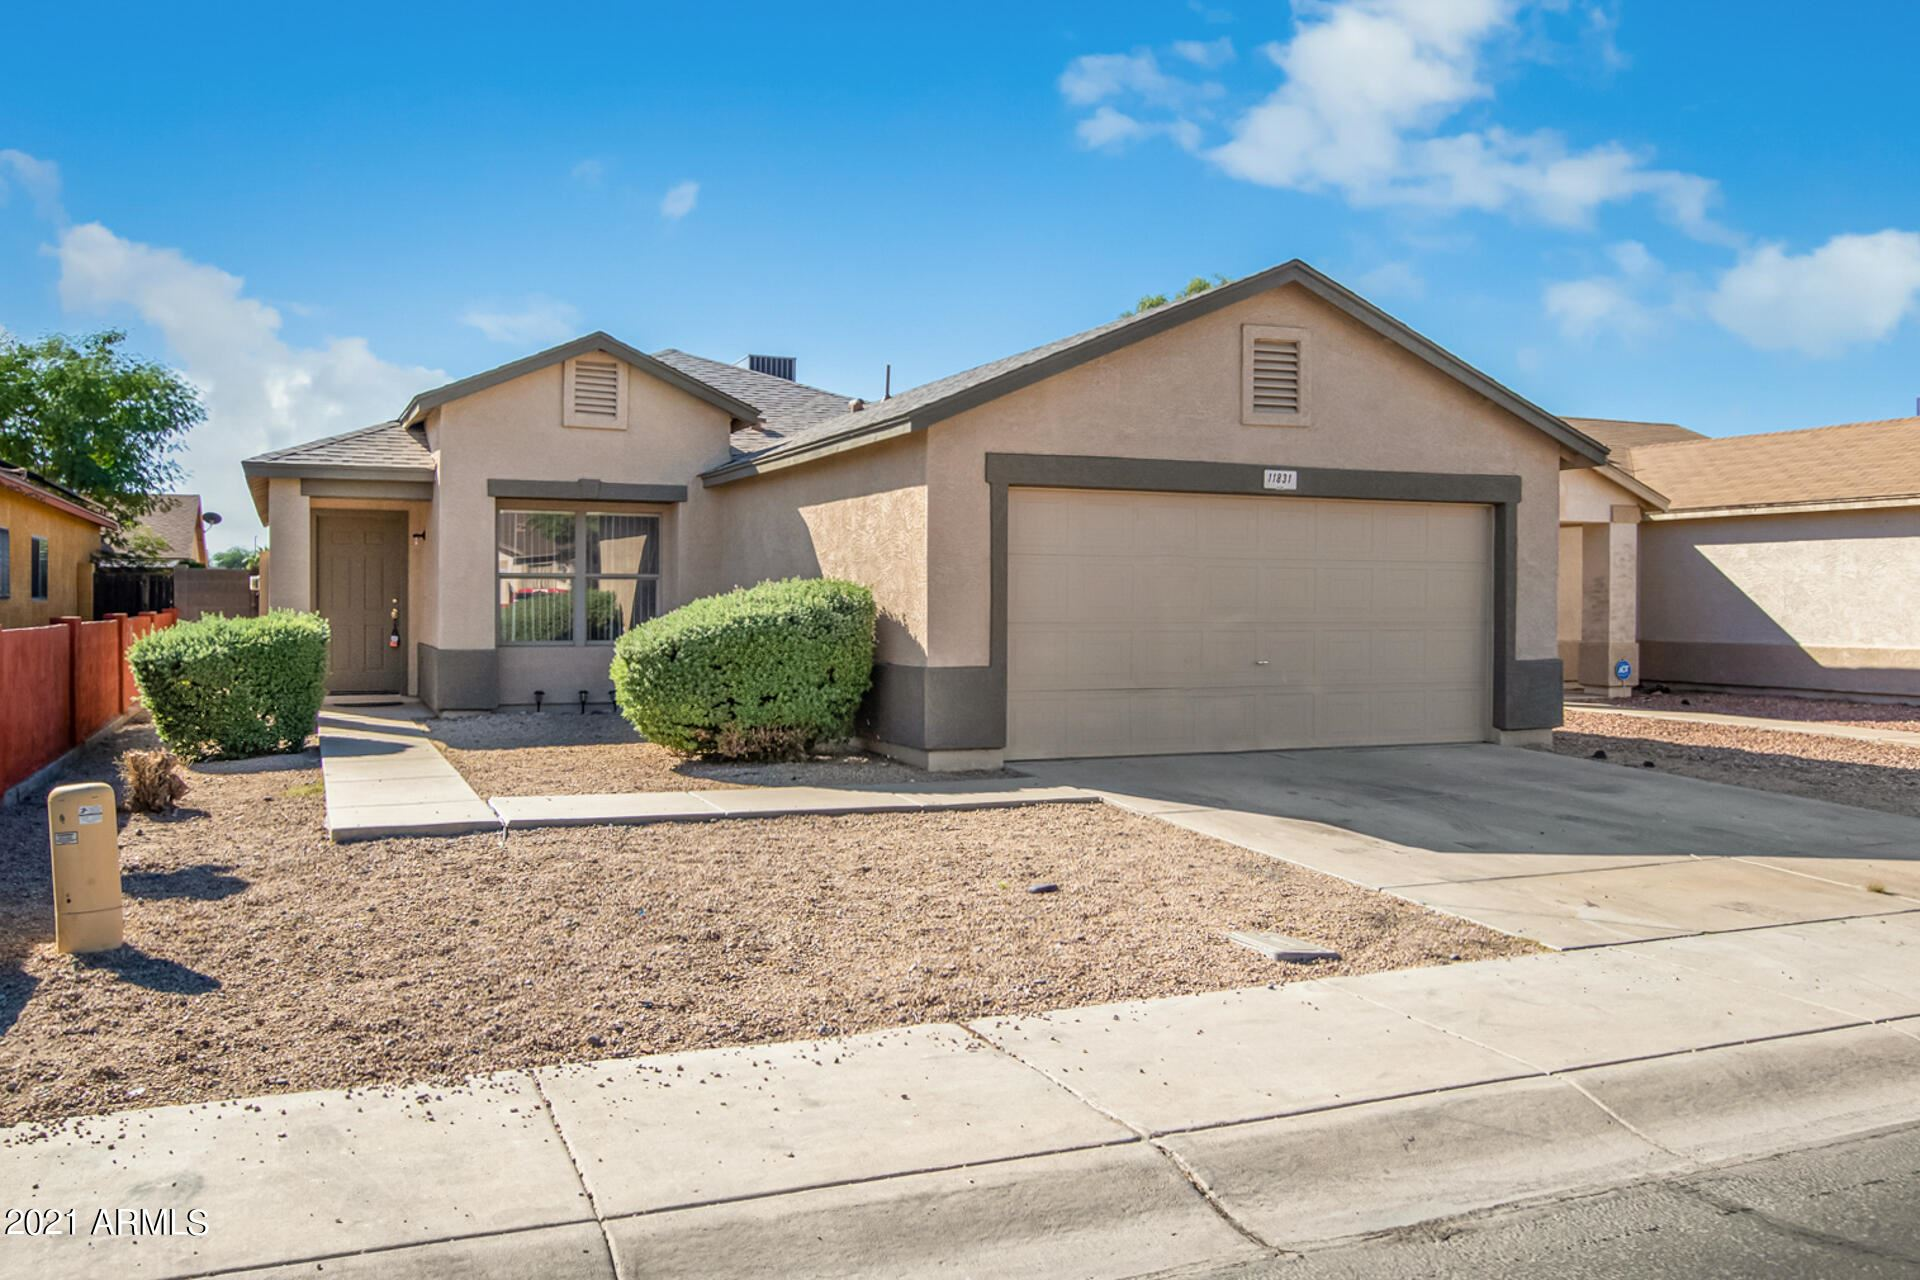 Photo of 11831 W SCOTTS Drive, El Mirage, AZ 85335 (MLS # 6307293)